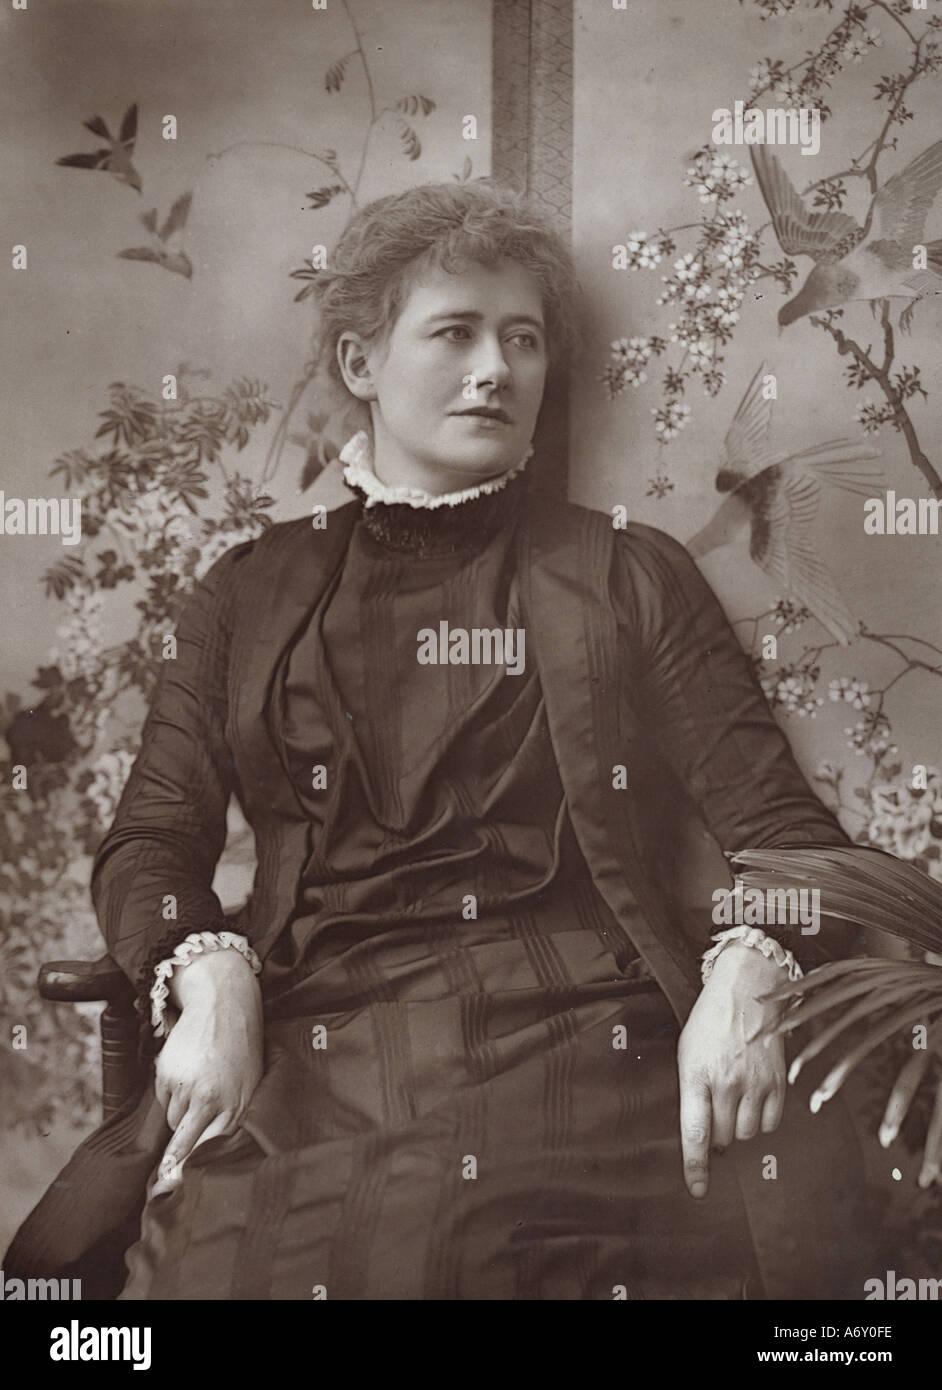 Ellen Terry. London, England, late 19th century. Stock Photo